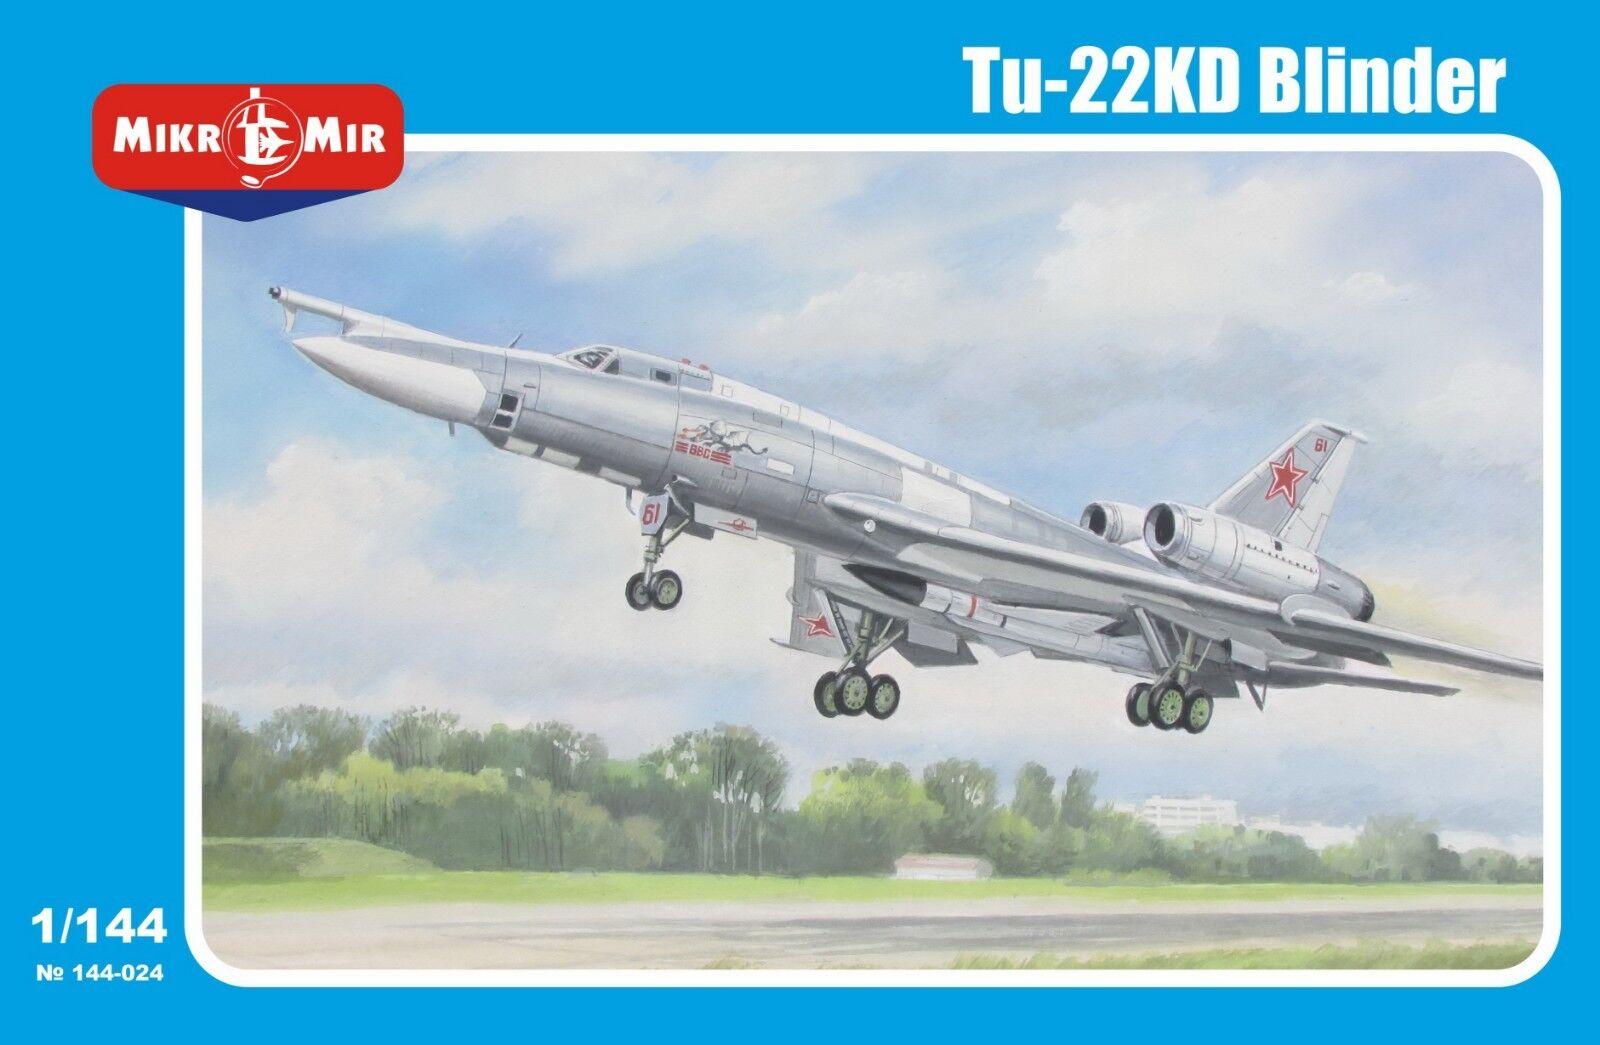 1 144 Tu-22 KD Shilo - new nice Mikromir model